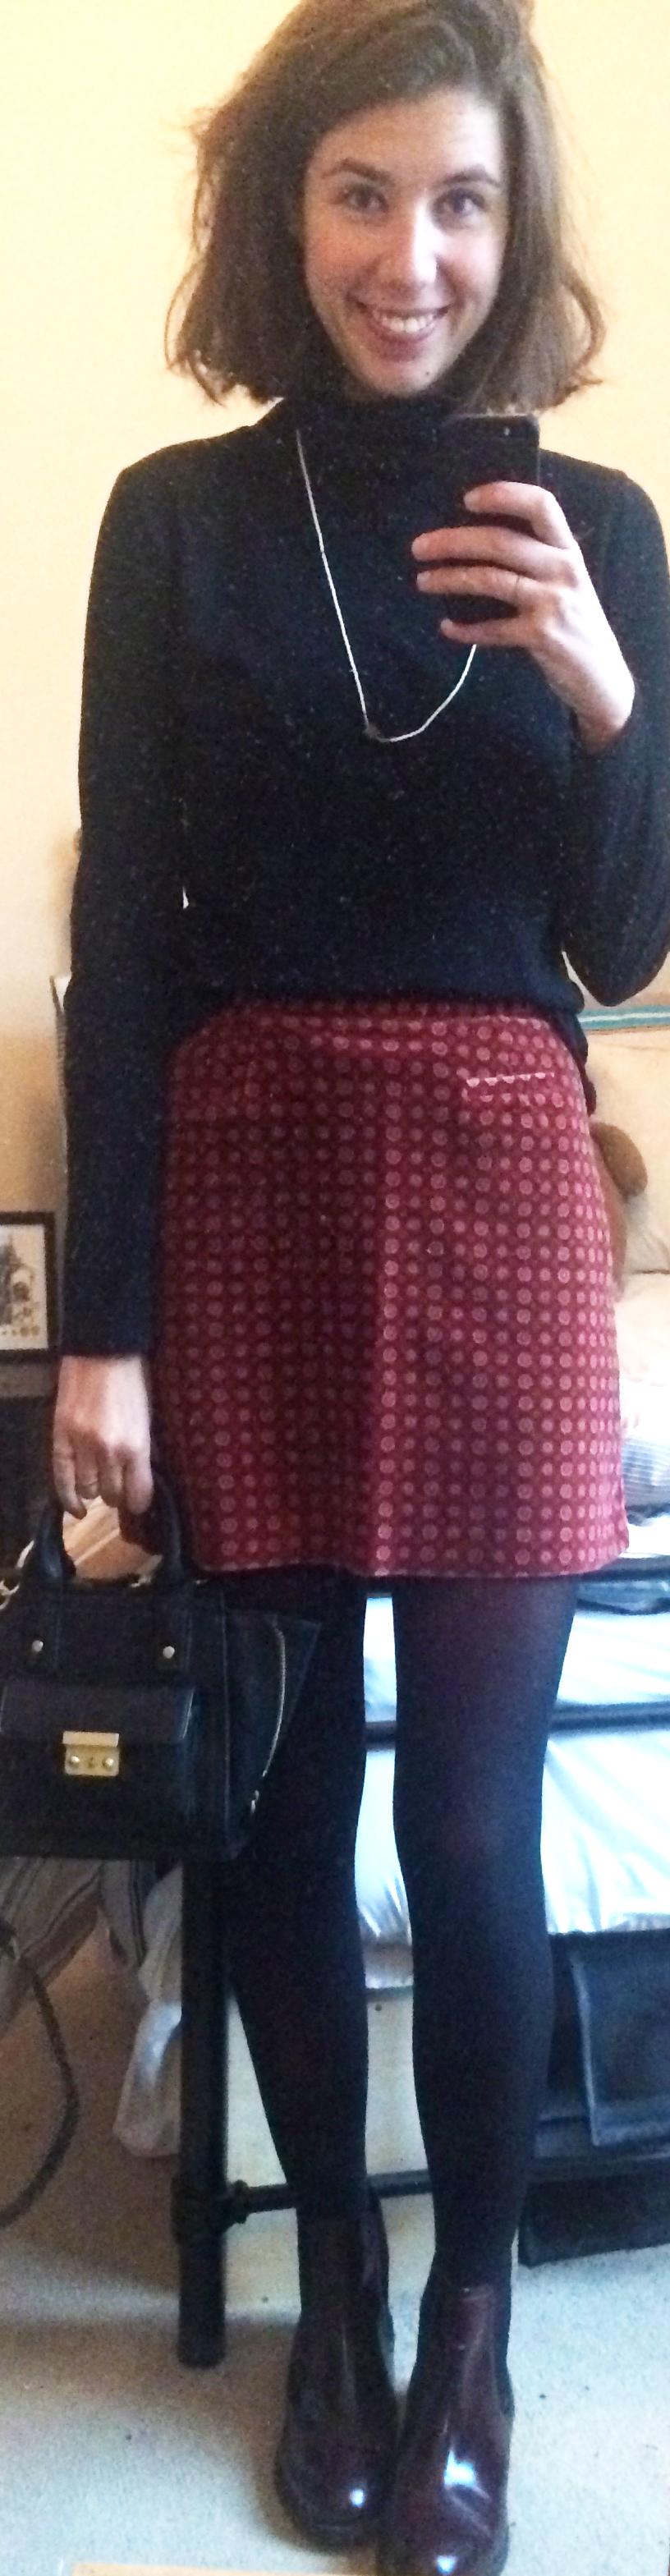 Burgundy Chelsea Boots ,  Black Tights , Phillip Lim for Target Bag,$2 Turtleneck, Thrifted Skirt, Thrifted Necklace